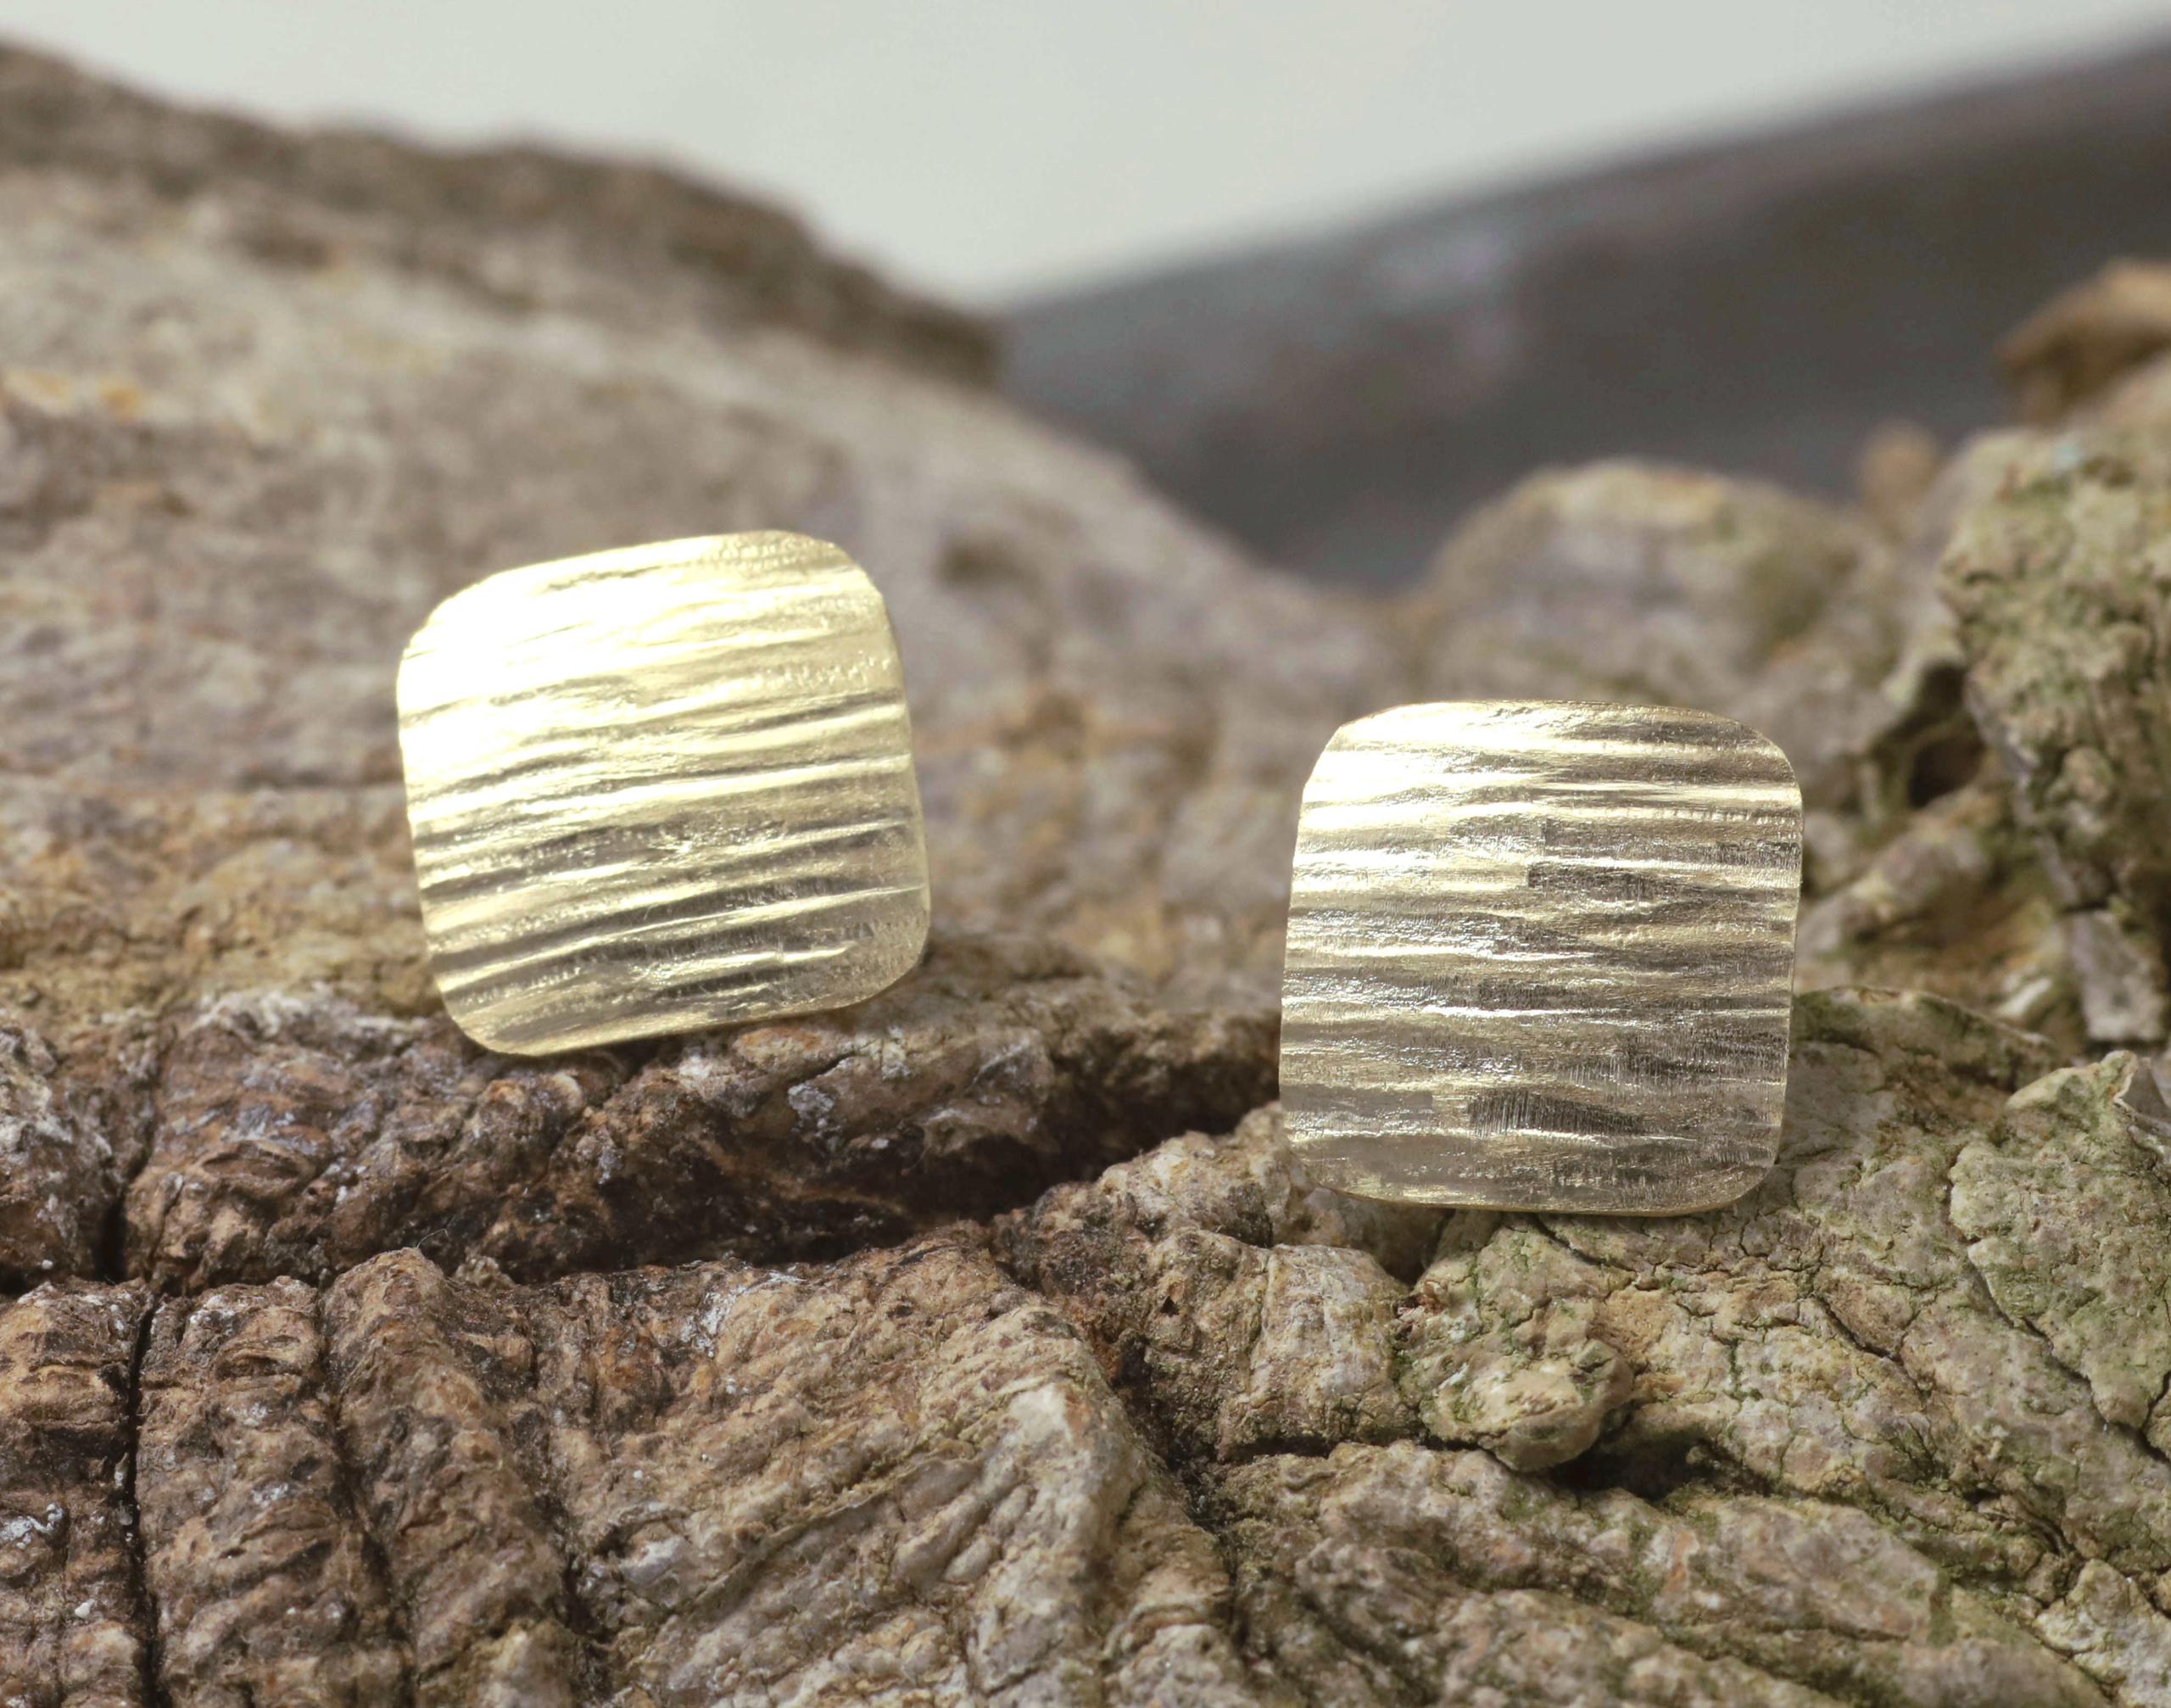 Oorbellen gereclycled goud geelgoud roségoud bewerkt gehamerd geruwd, kussenvormig oorstekers handgemaakt LYAM edelsmeden